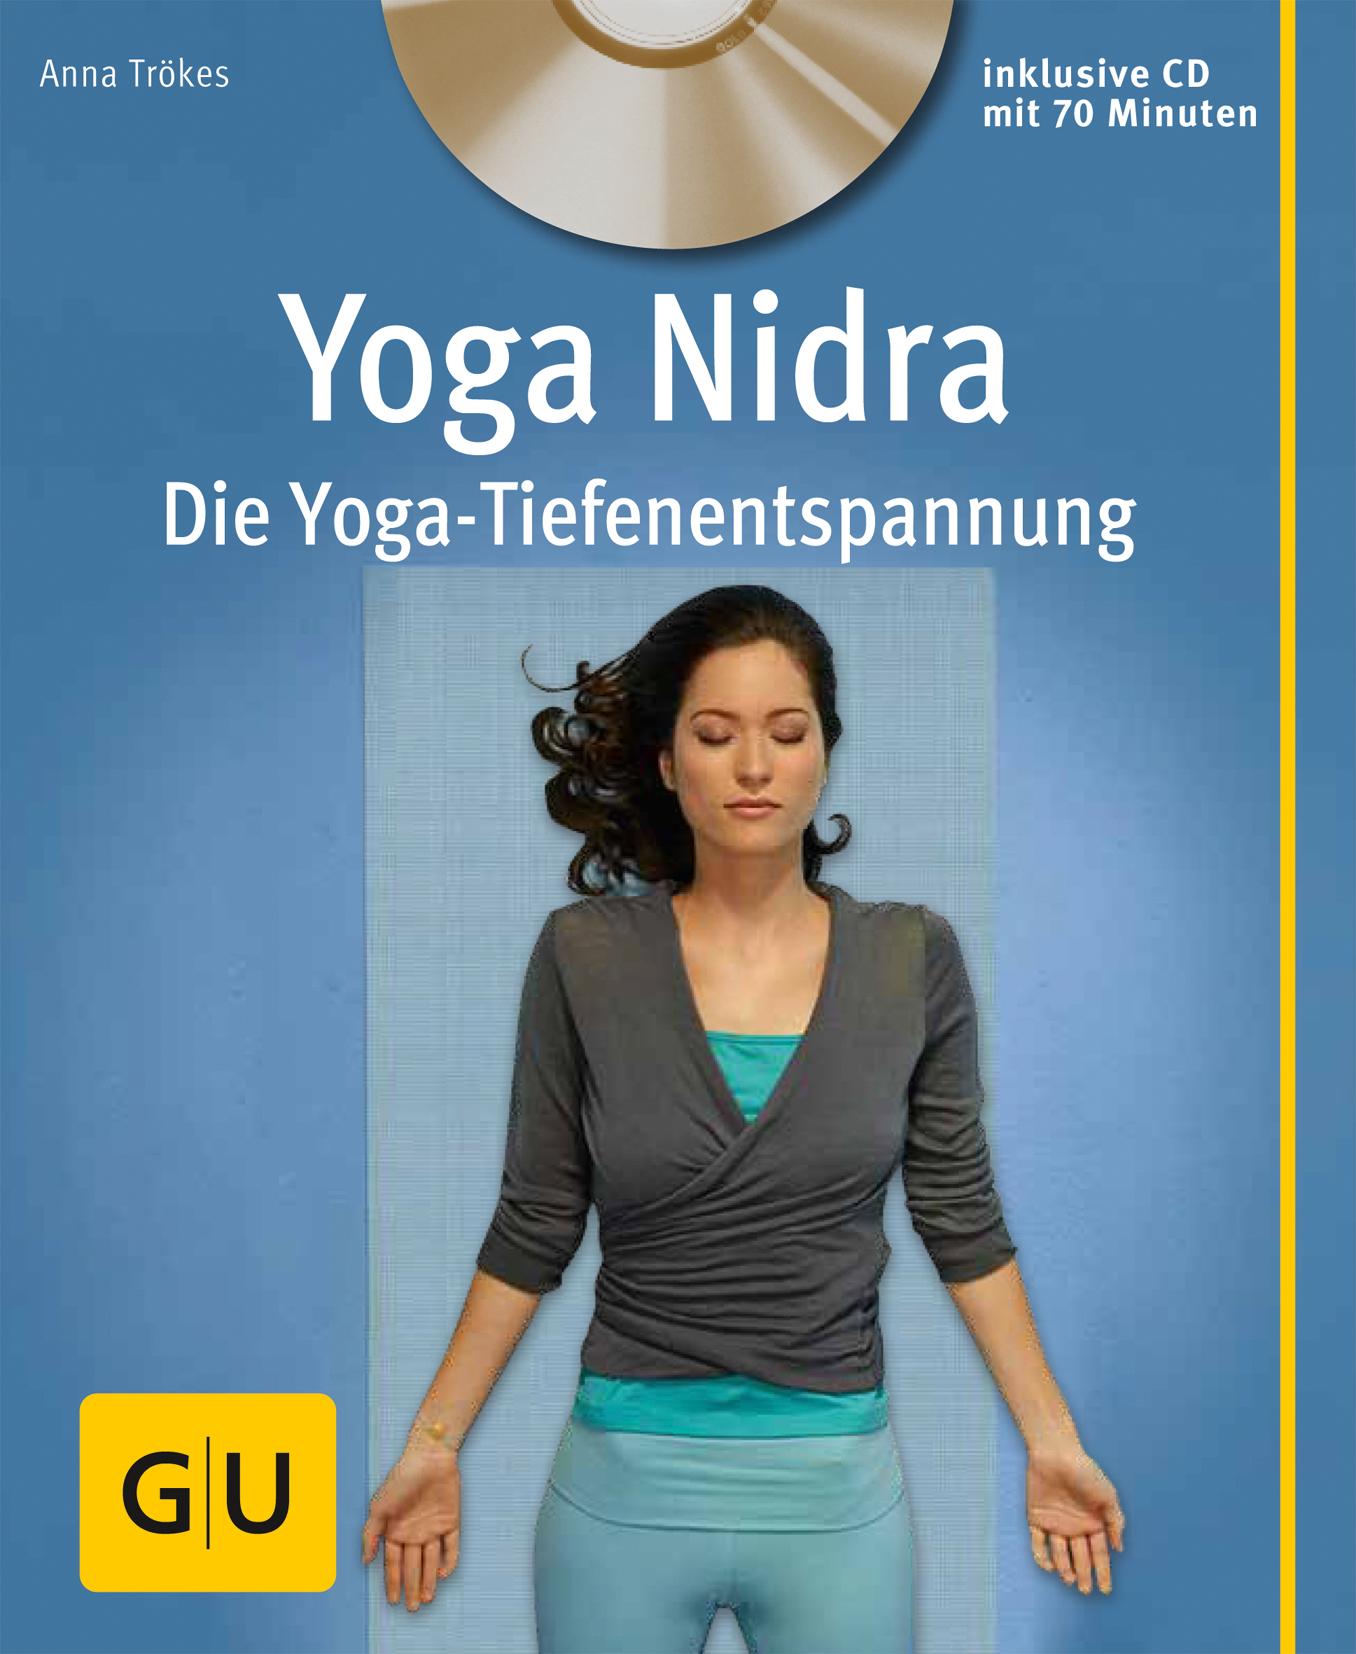 Yoga Nidra: Die Yoga-Tiefenentspannung - Anna Trökes [mit Audio CD]